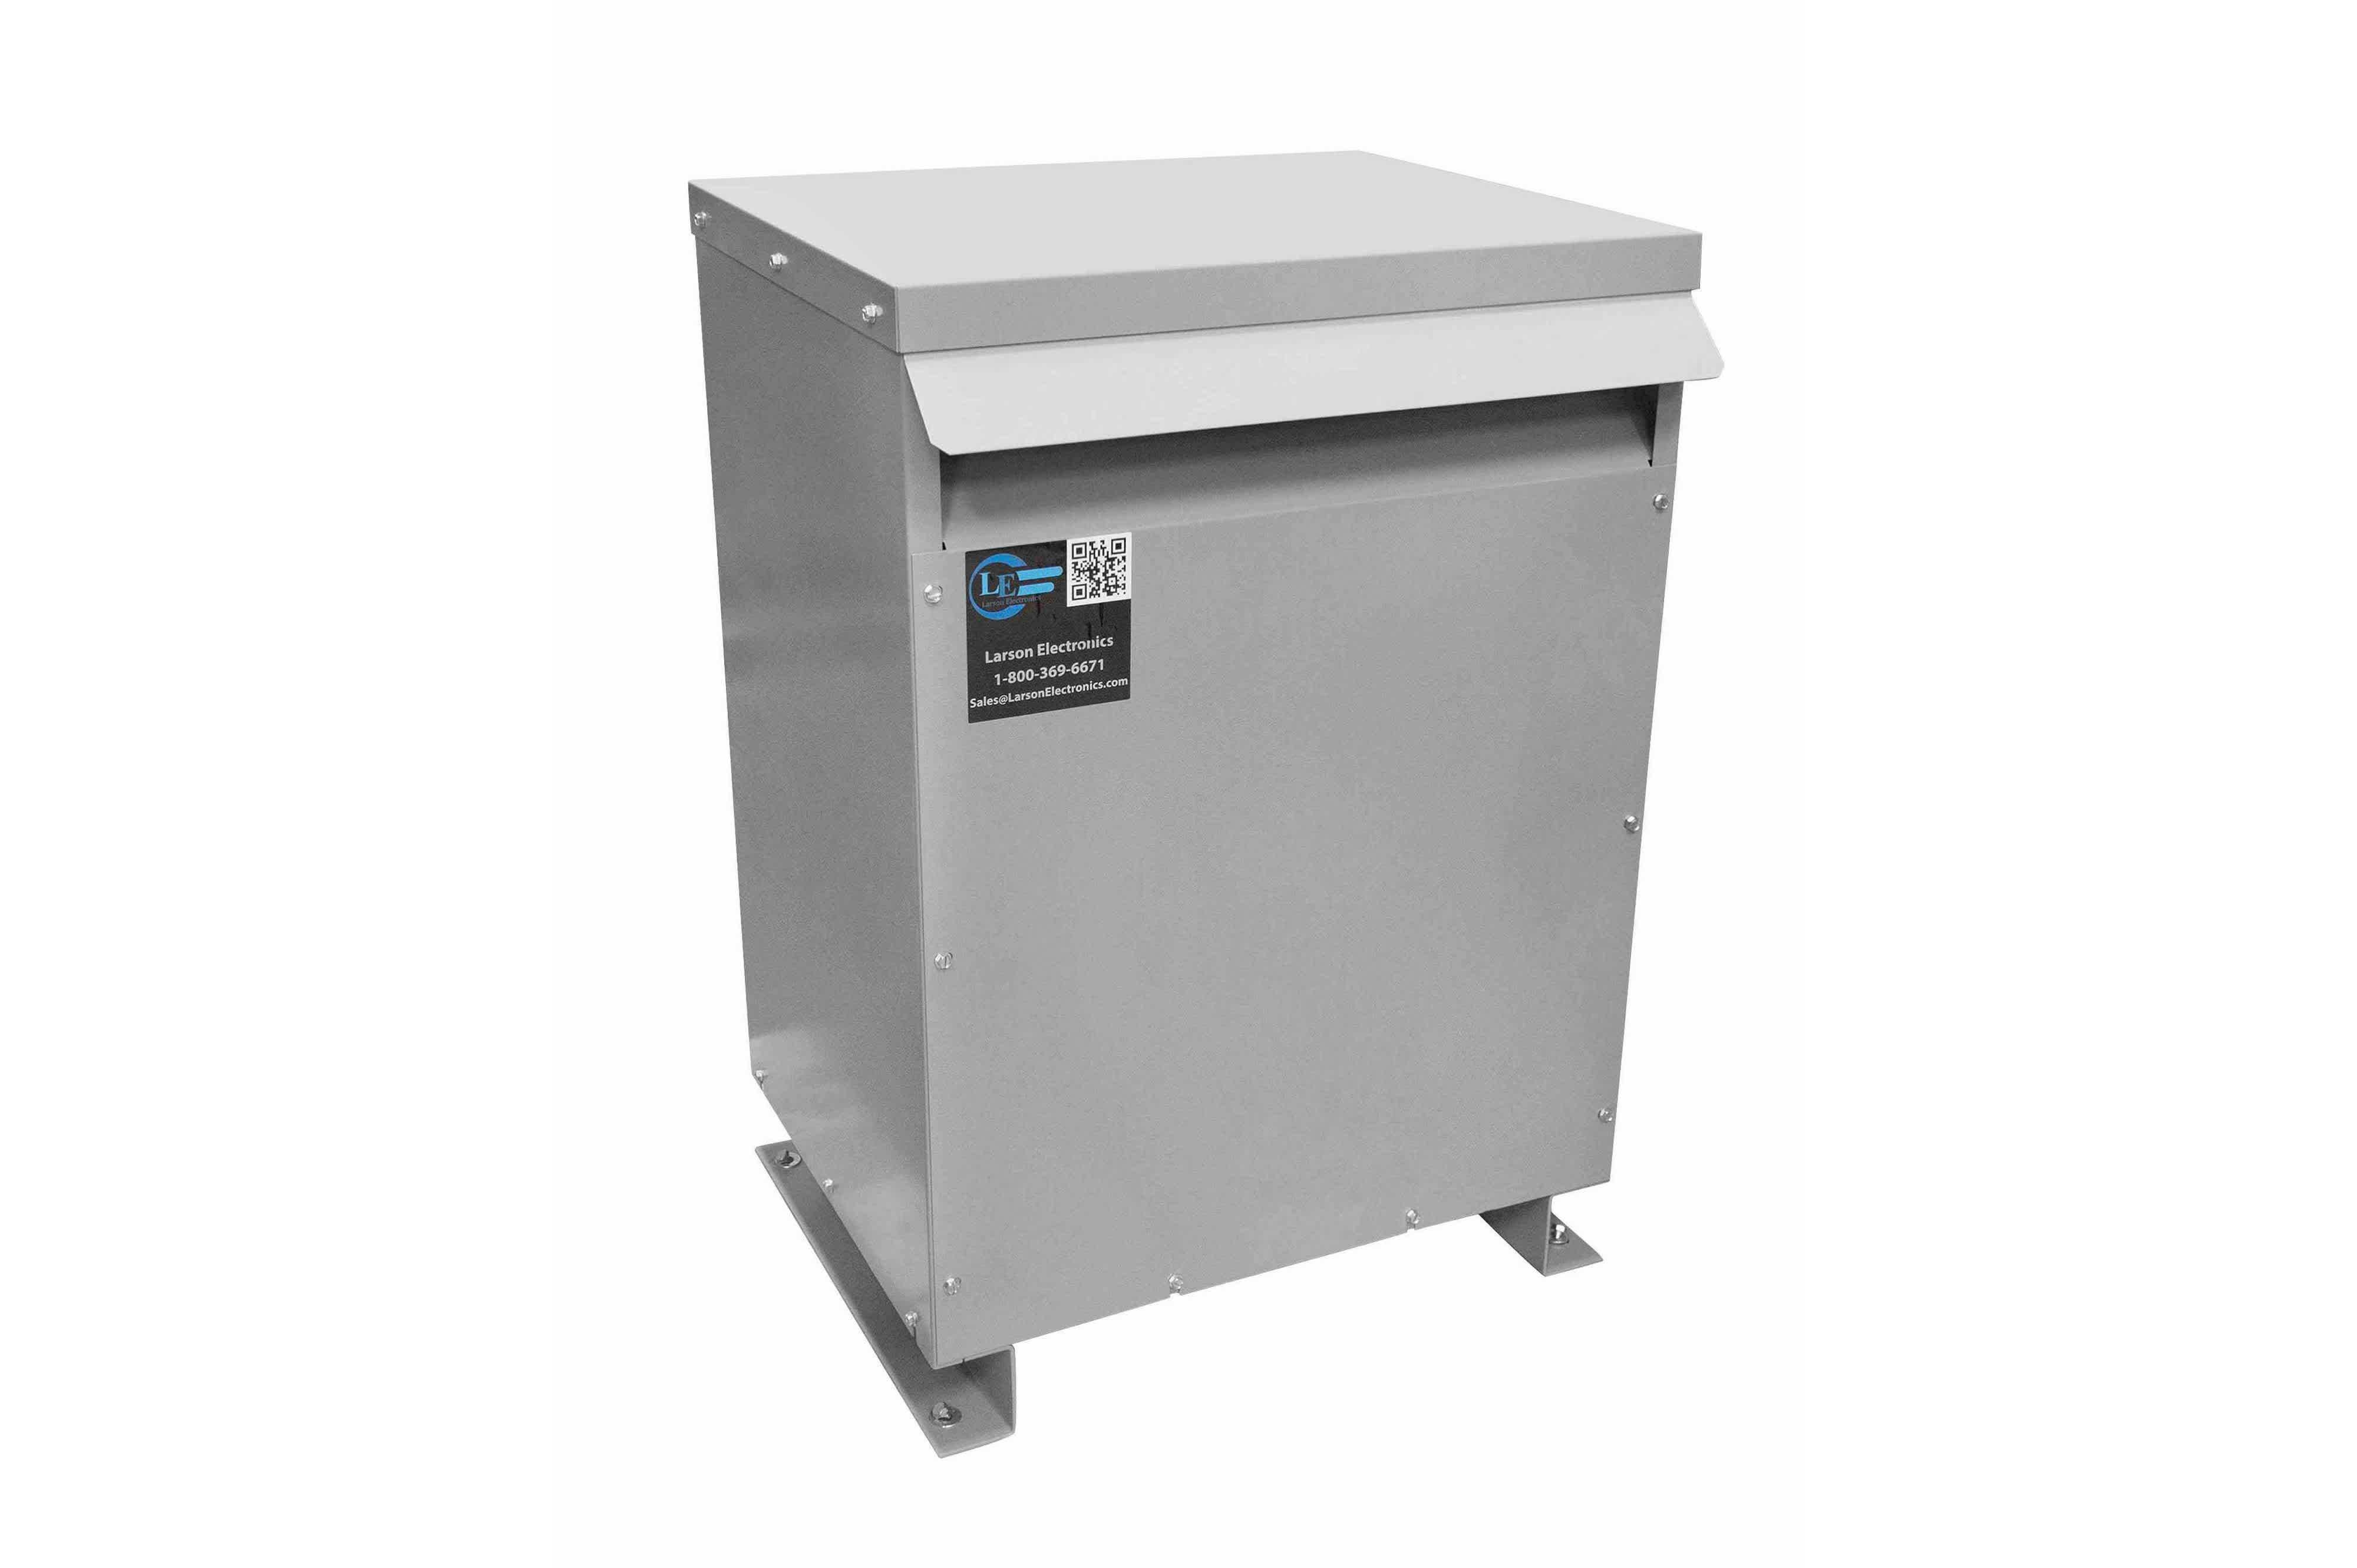 75 kVA 3PH Isolation Transformer, 230V Wye Primary, 480Y/277 Wye-N Secondary, N3R, Ventilated, 60 Hz